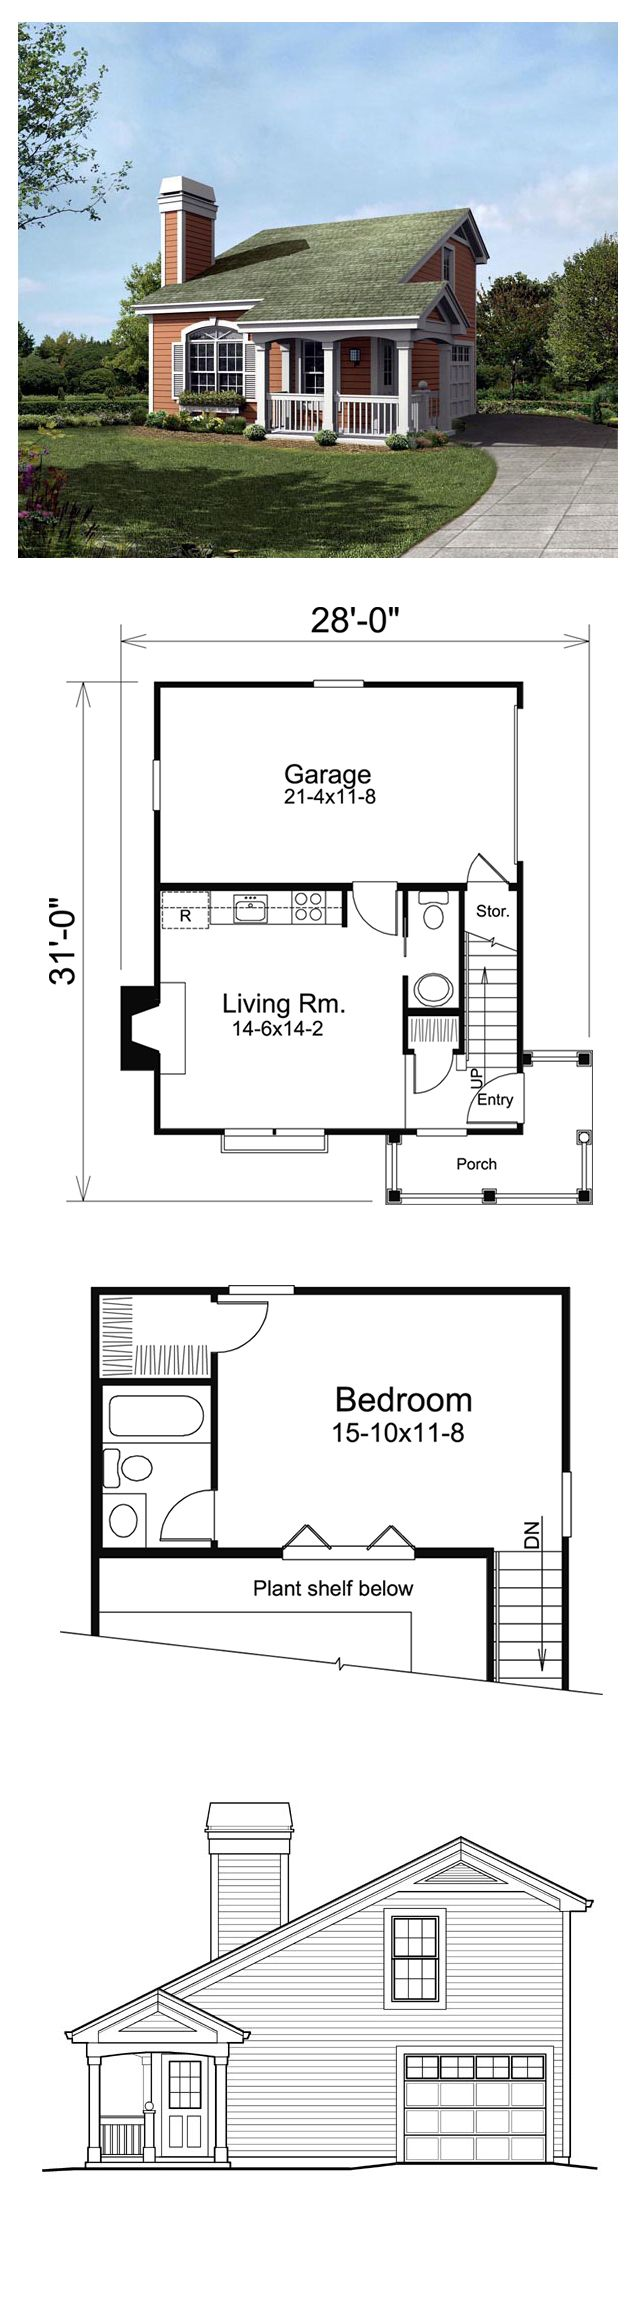 16 best saltbox house plans images on pinterest cool house plans saltbox style cool house plan id chp 51447 total living area 641